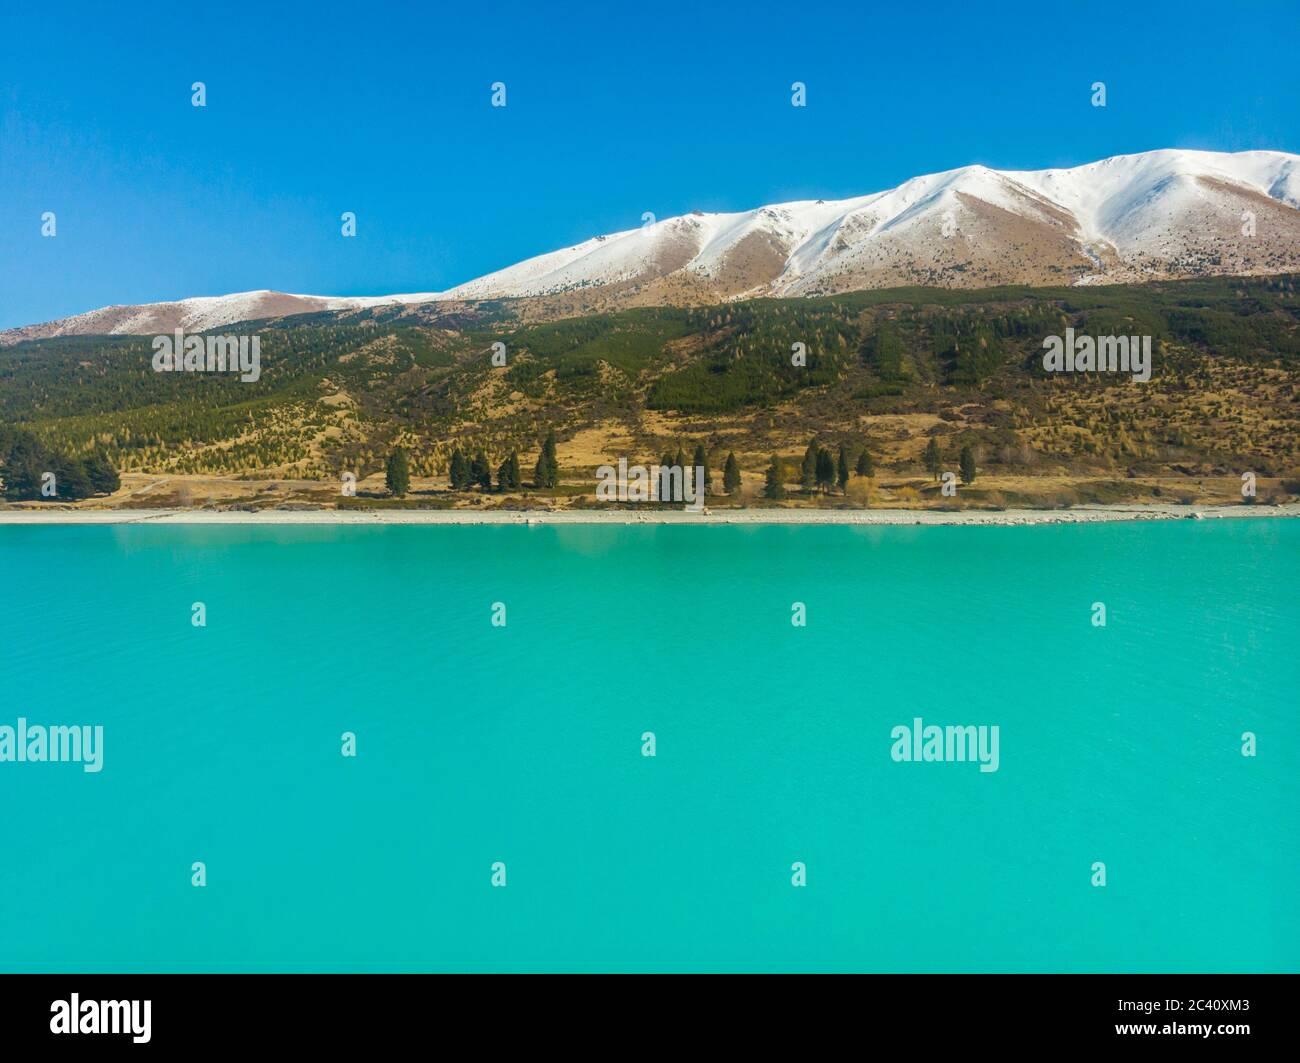 Scenic aerial view of Lake Pukaki, South Island, New Zealand Stock Photo